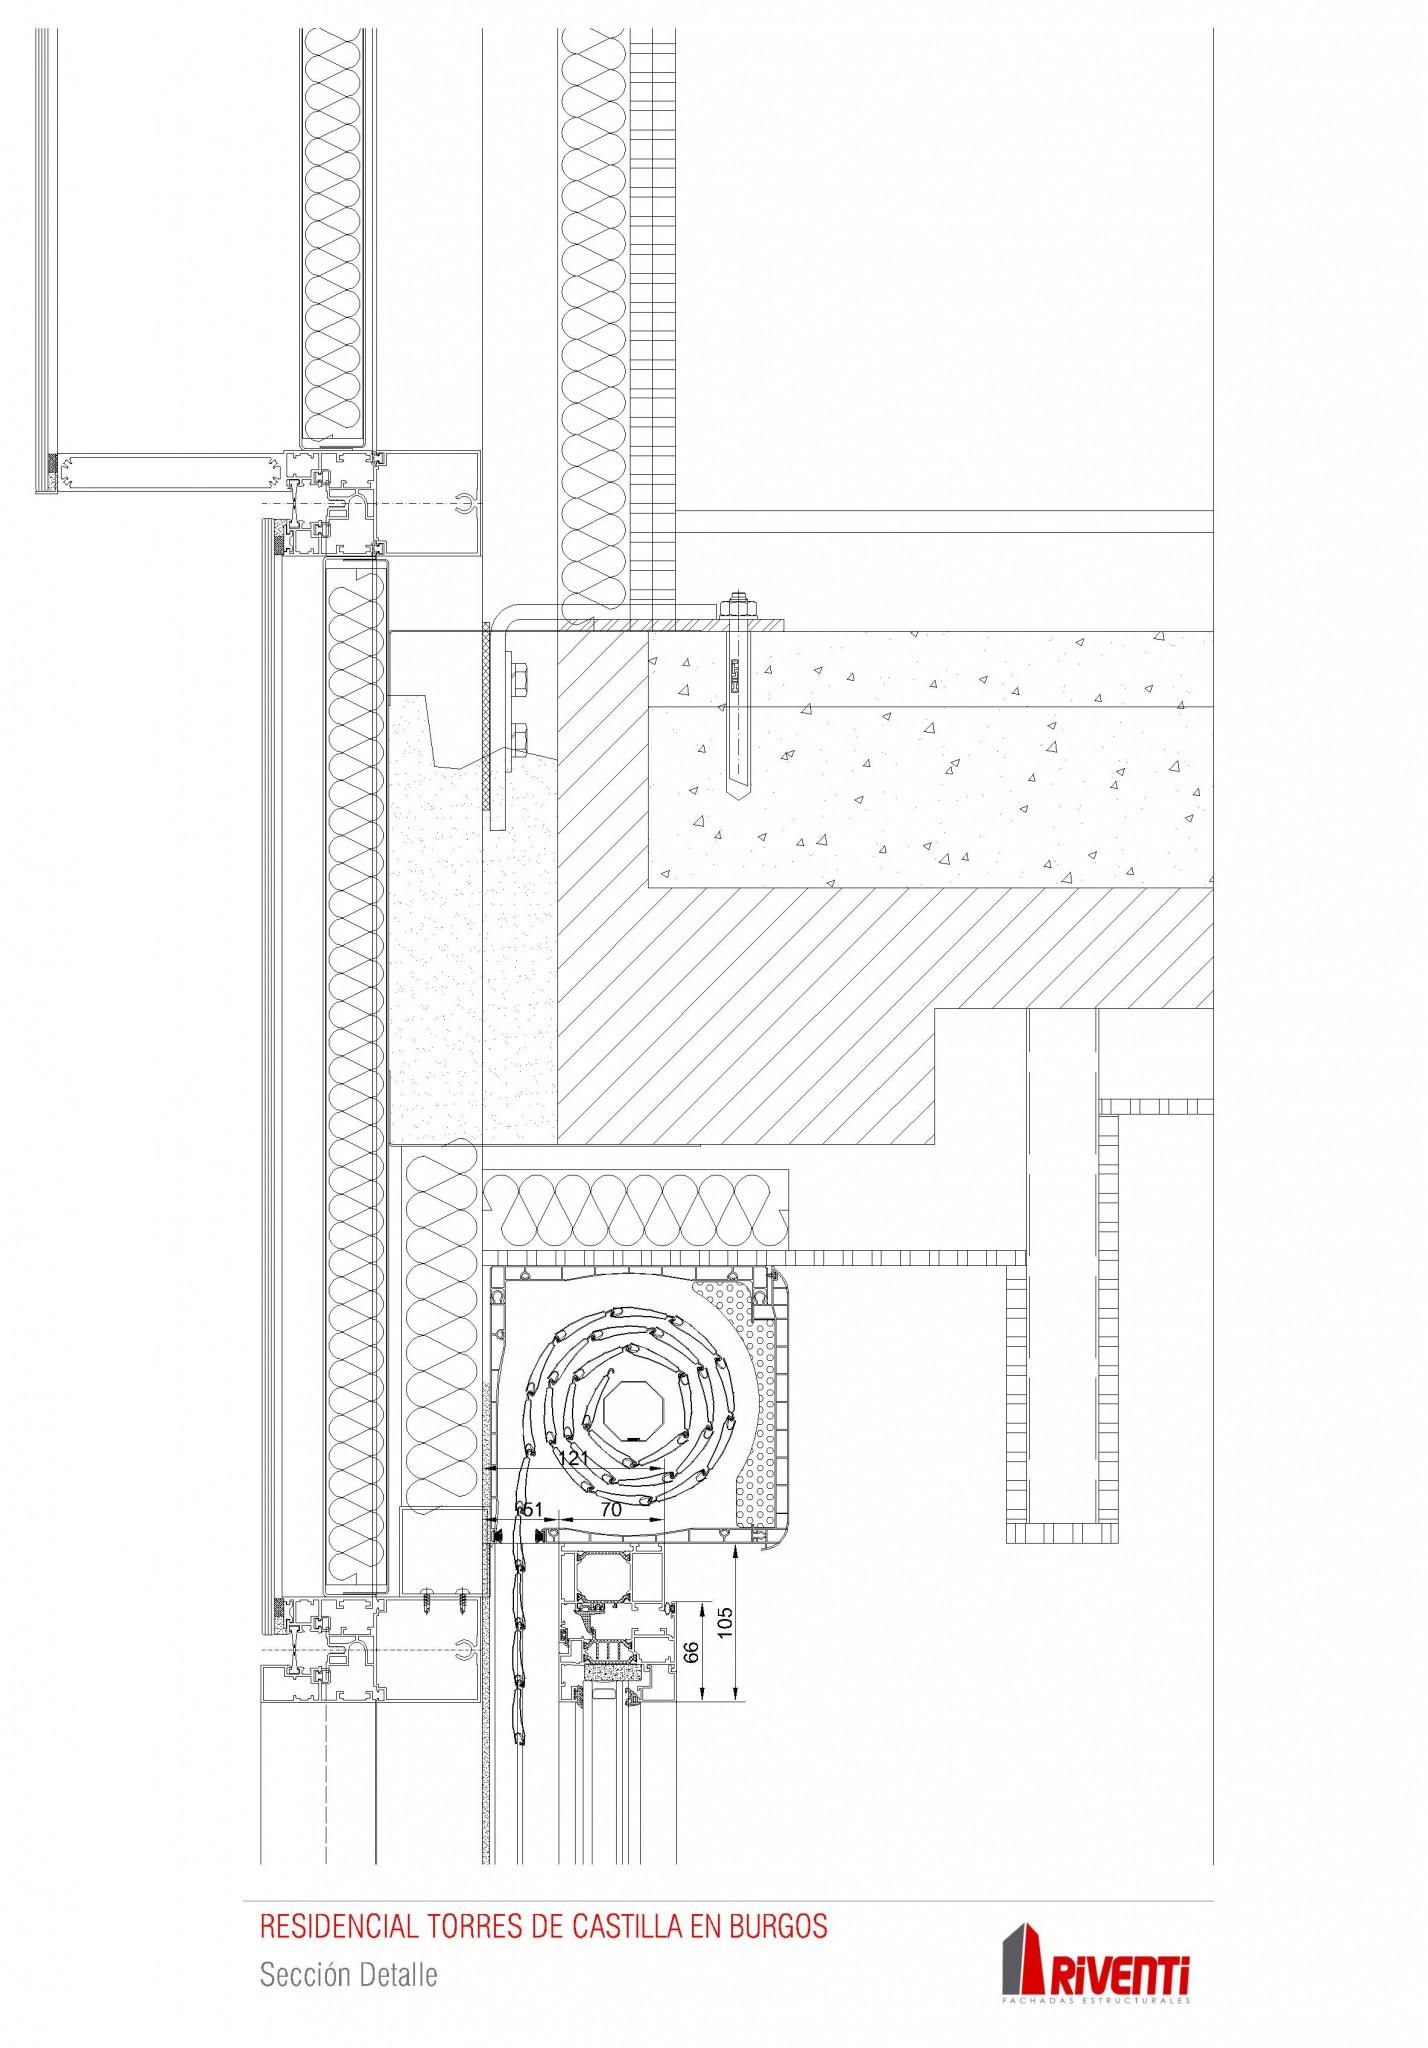 FACHADA-TORRES DE CASTILLA-DETALLES CONSTRUCTIVOS-RIVENTI (2)